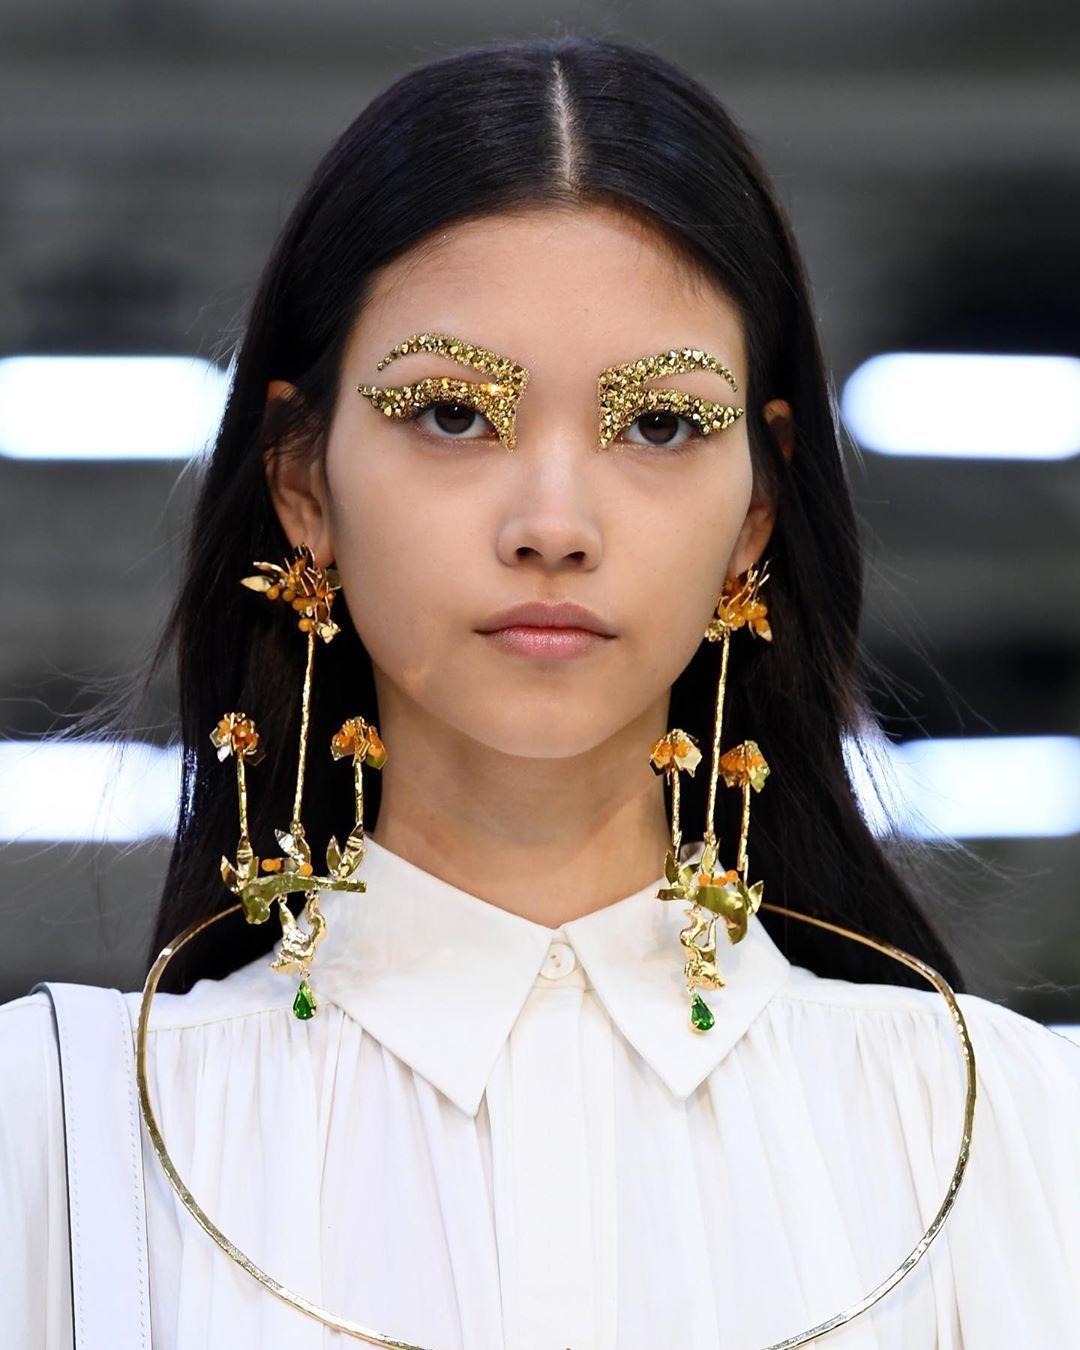 Fashion Week Makeup Notes - BSB: Beauty news, makeup